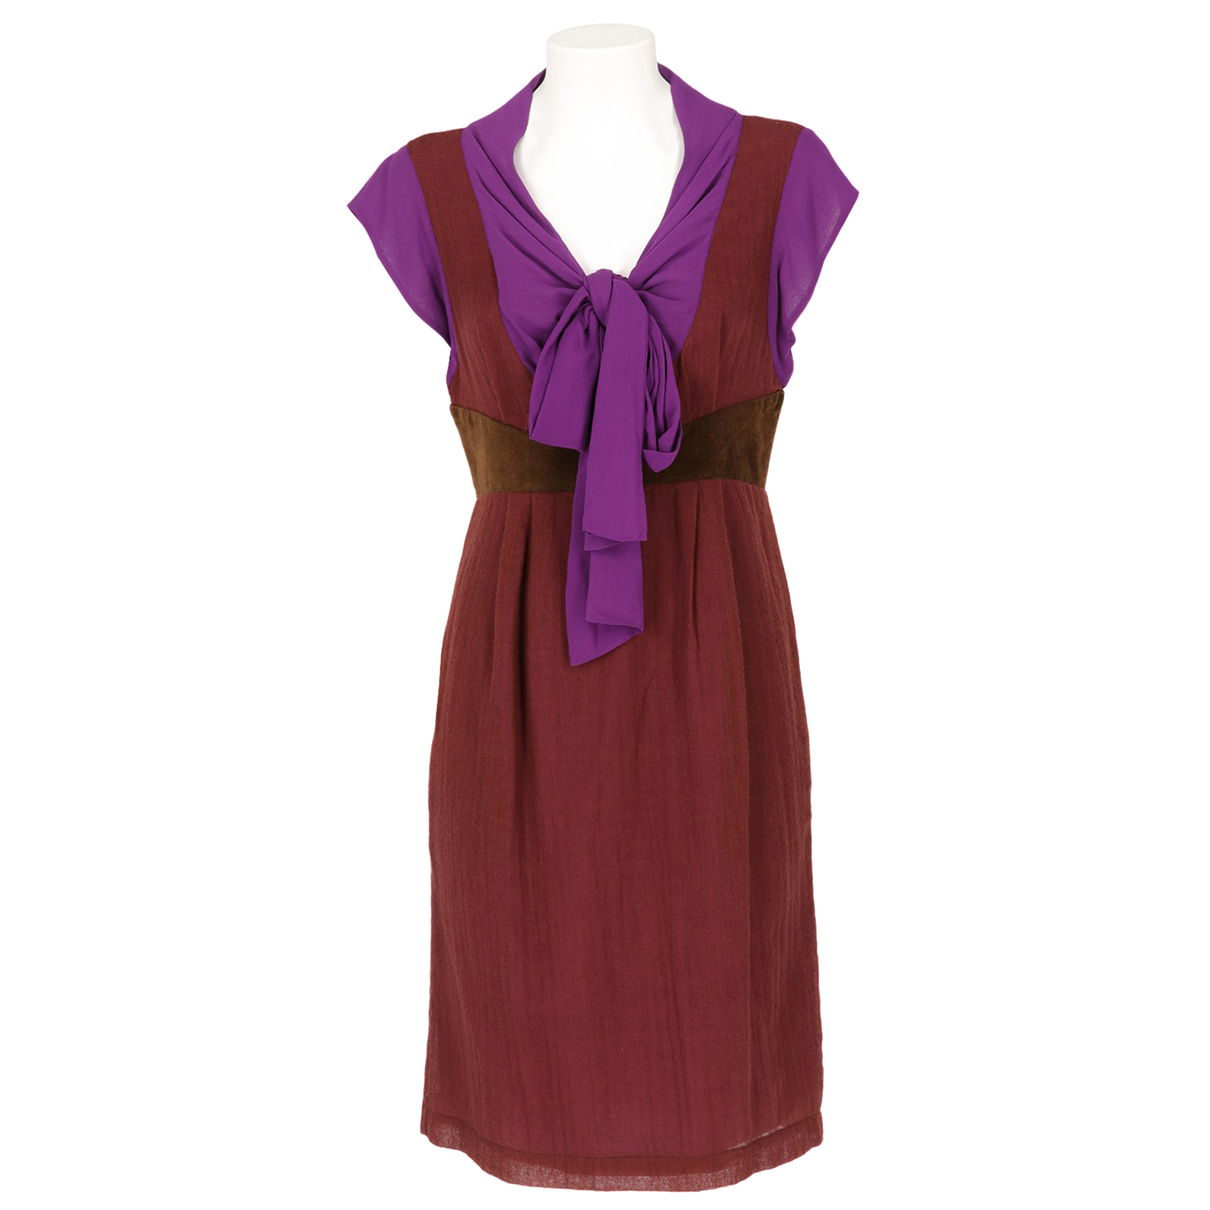 Kenzo \N Brown Cotton dress for Women 38 FR